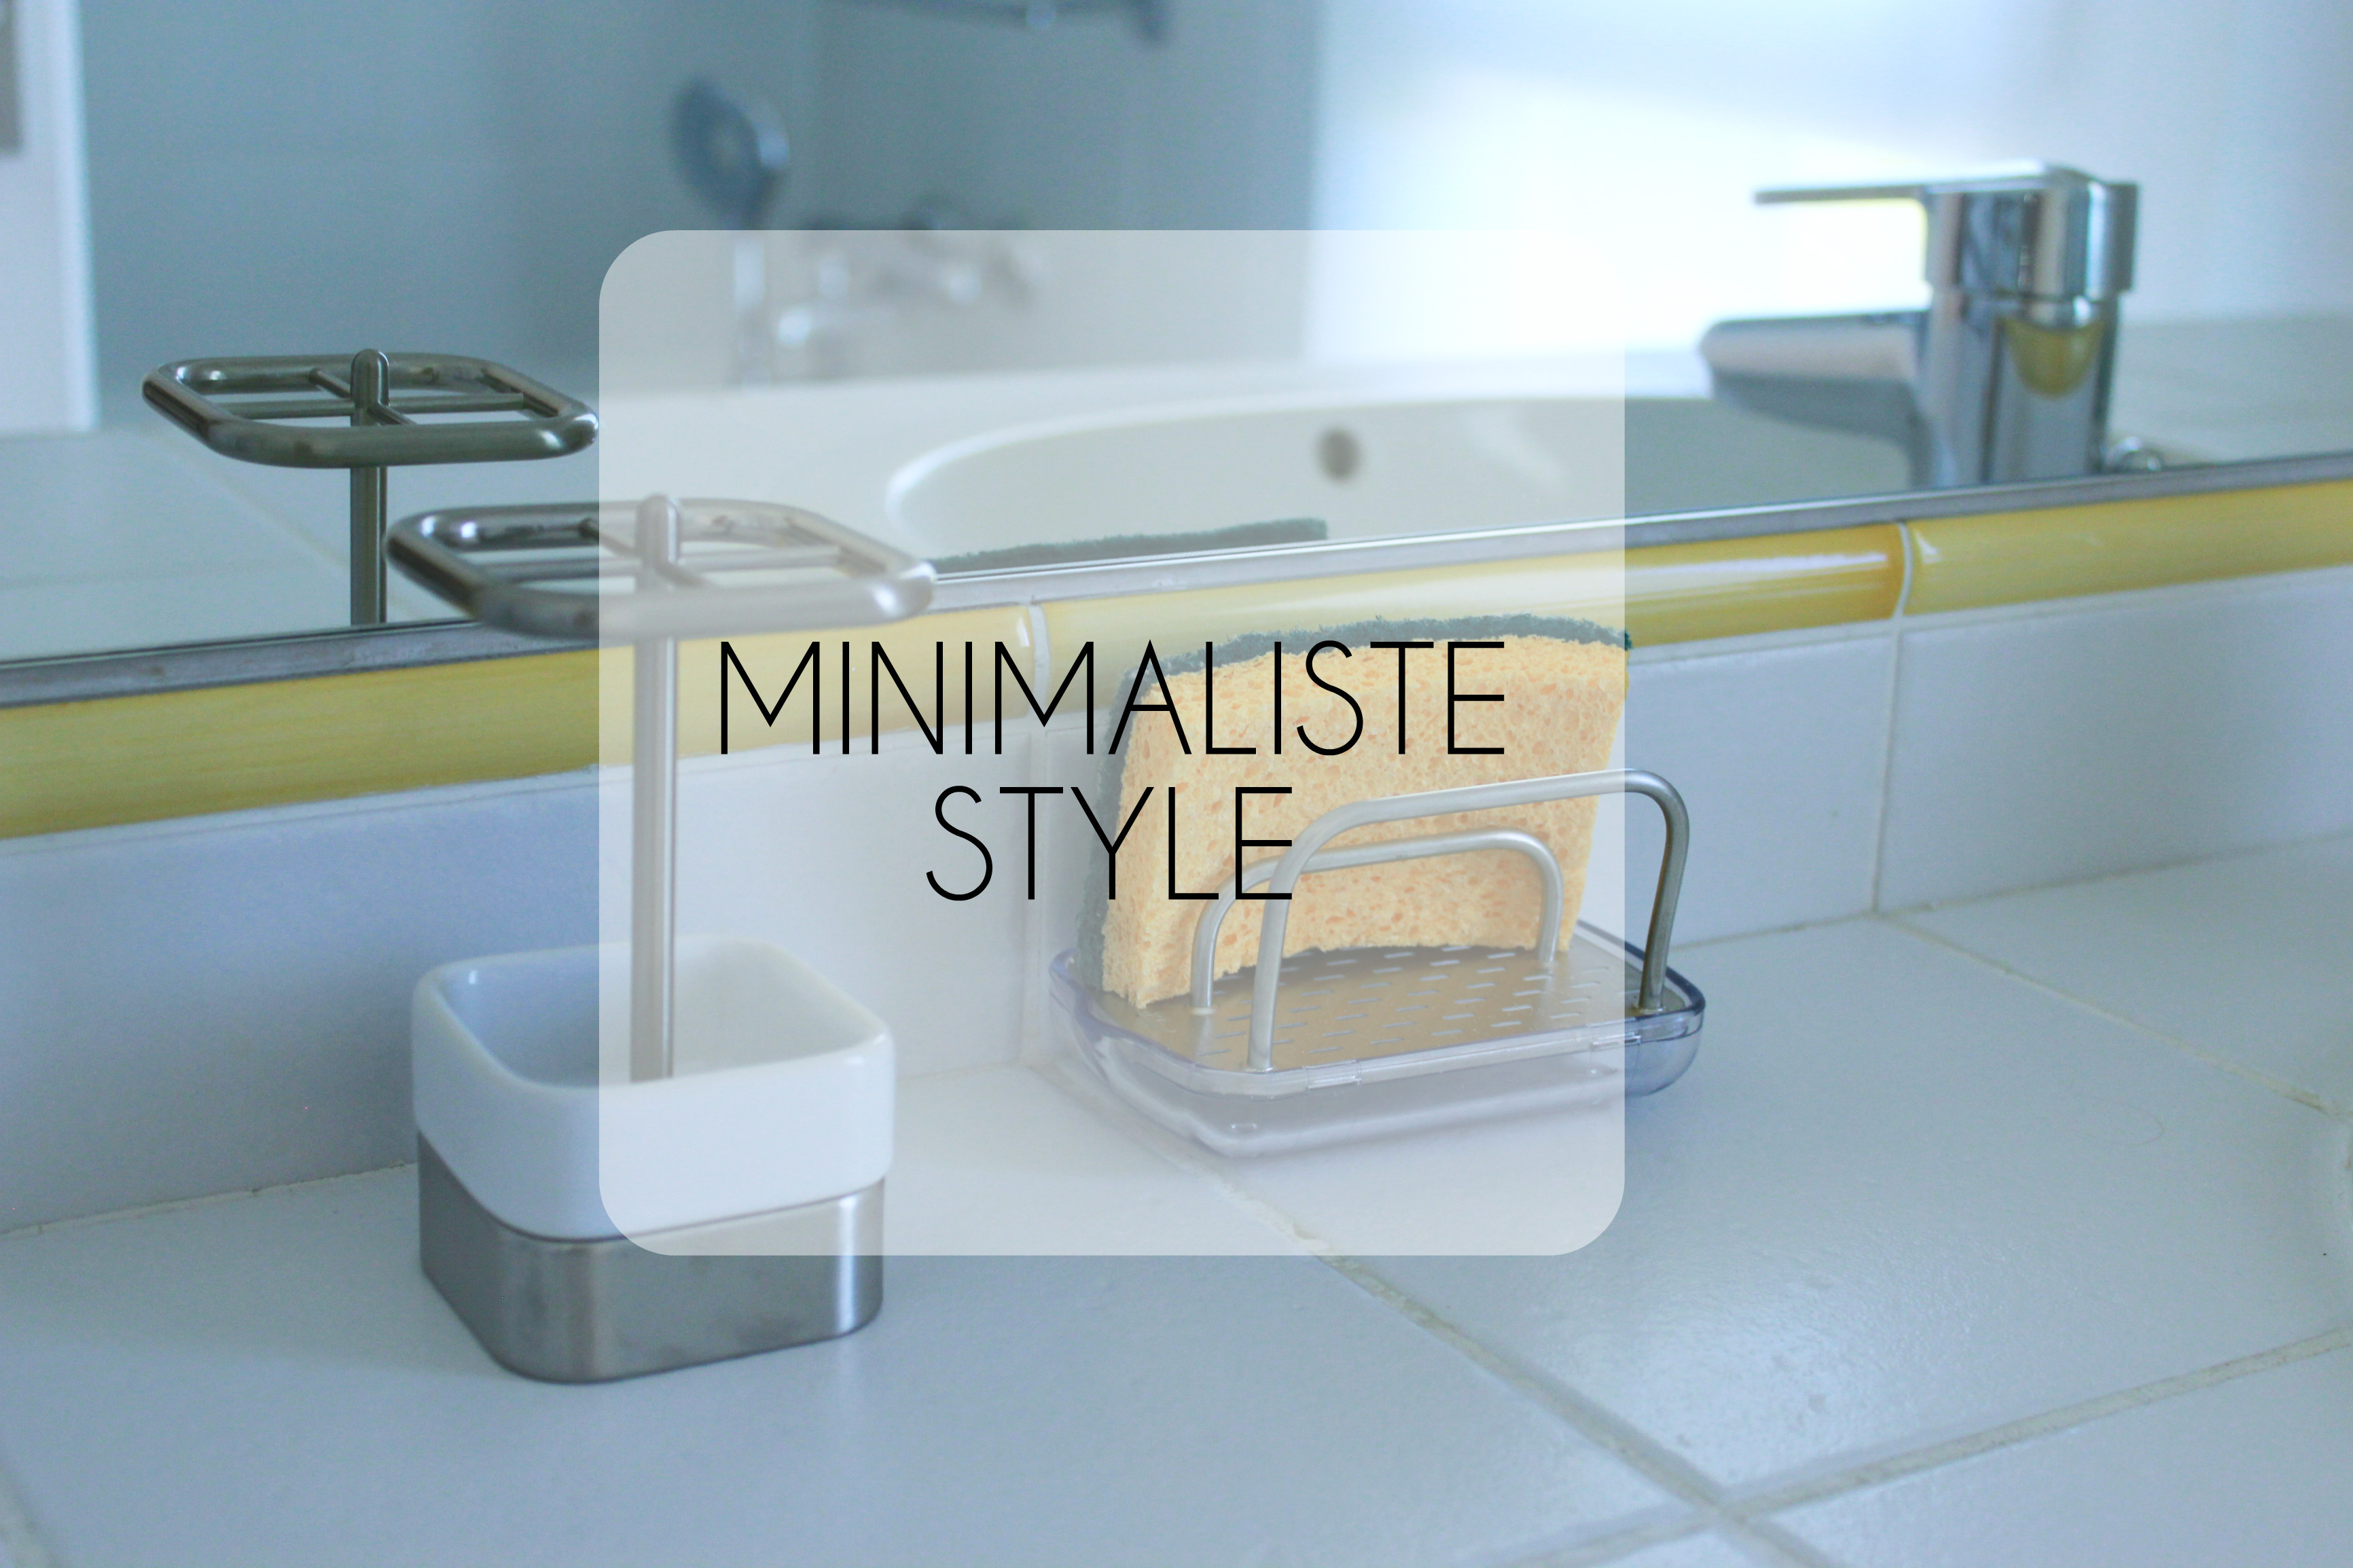 Minimaliste style mes derniers achats for Oui non minimaliste